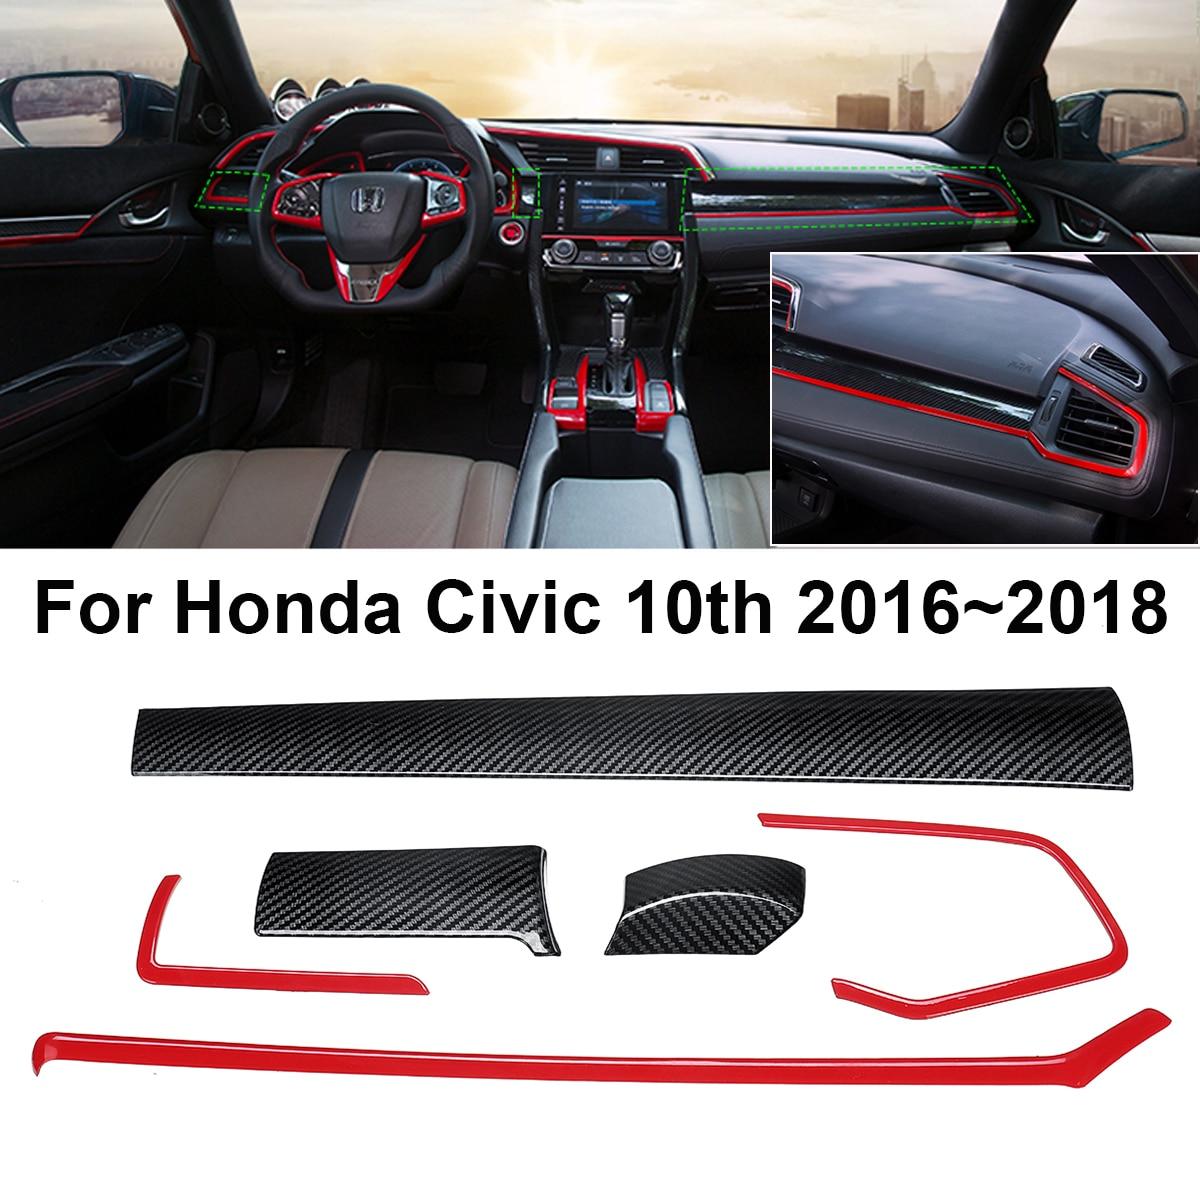 6PCS Carbon Fiber Console Center Dashboard Cover Trims for Honda Civ ic 10th 2016 2017 Carbon Fiber Style Interior Mouldings yandex w205 amg style carbon fiber rear spoiler for benz w205 c200 c250 c300 c350 4door 2015 2016 2017